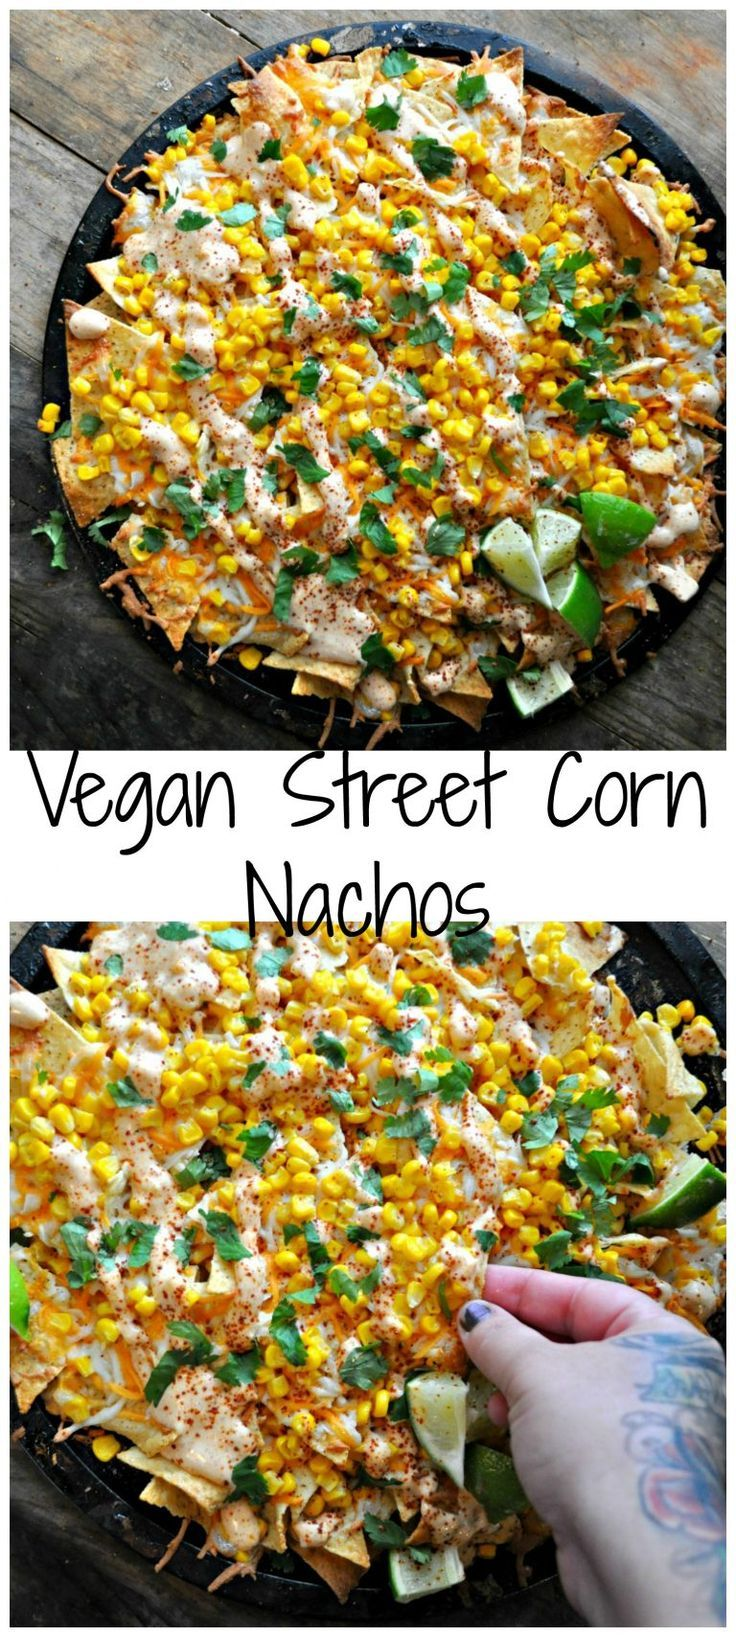 Corn Nachos Street Vegan Vegan Street Corn Nachos